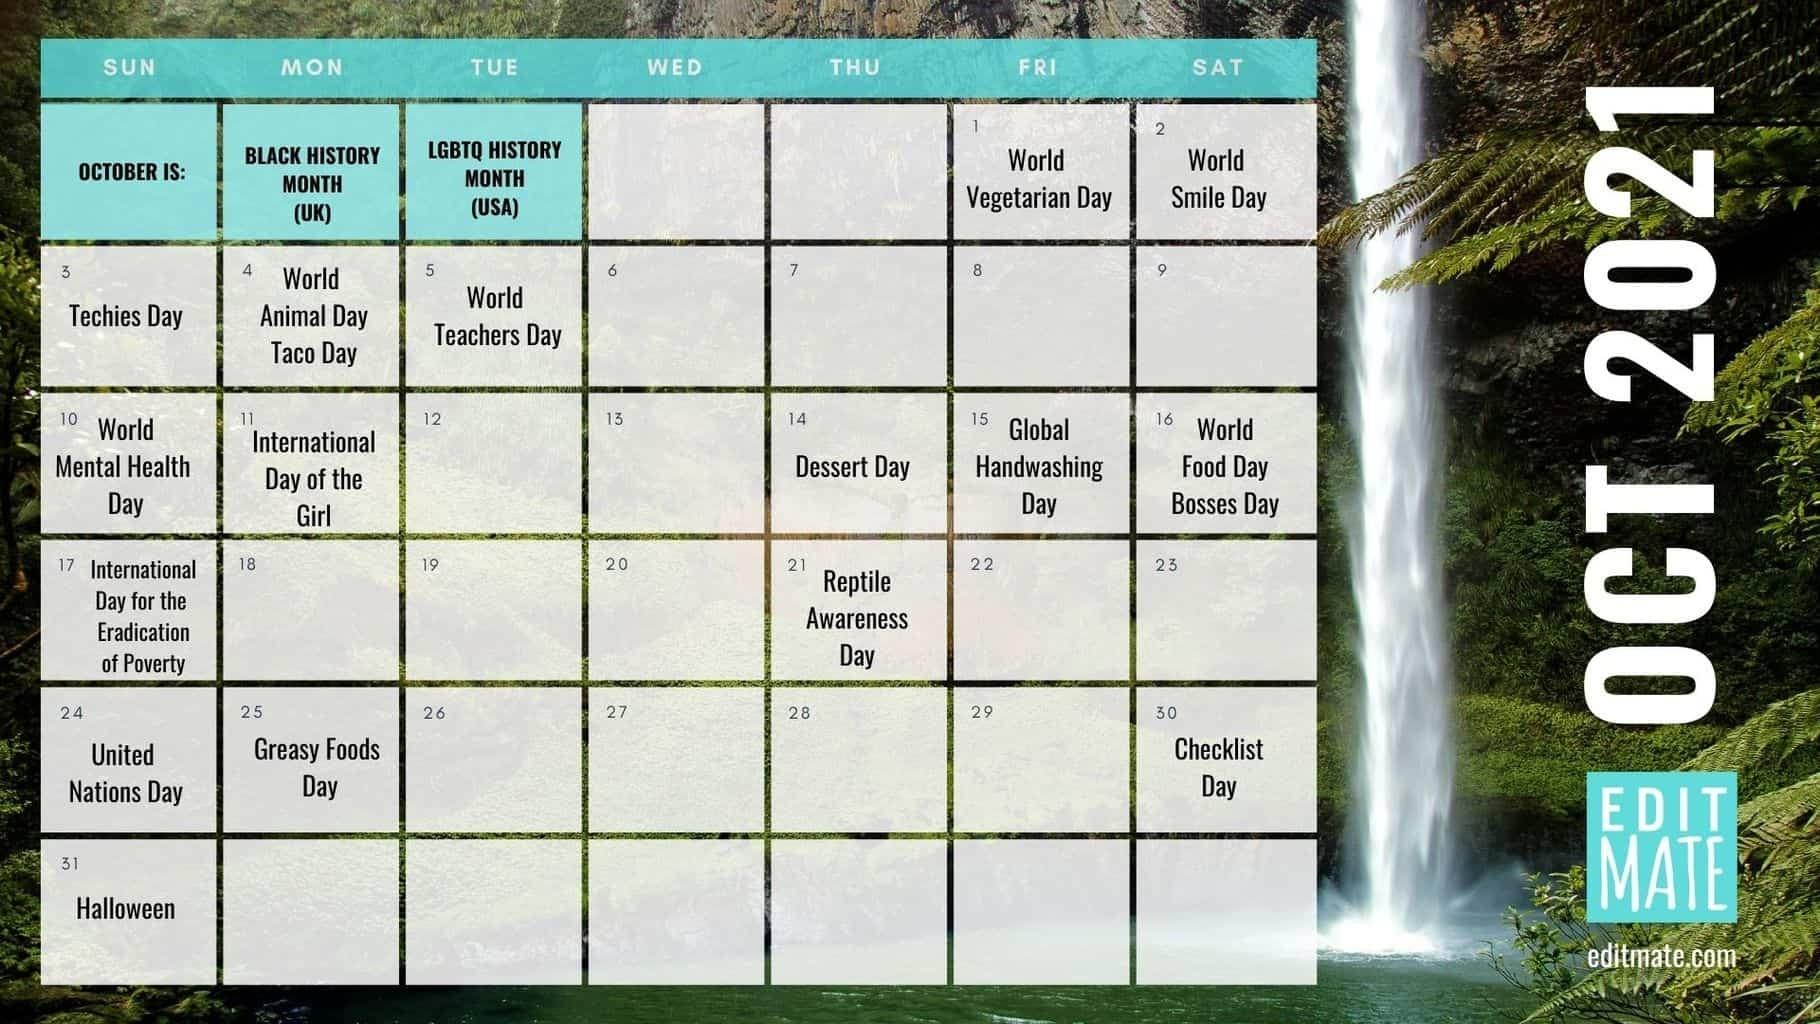 2021 Social Media Holiday Calendar | Editmate National Calendar October 2021